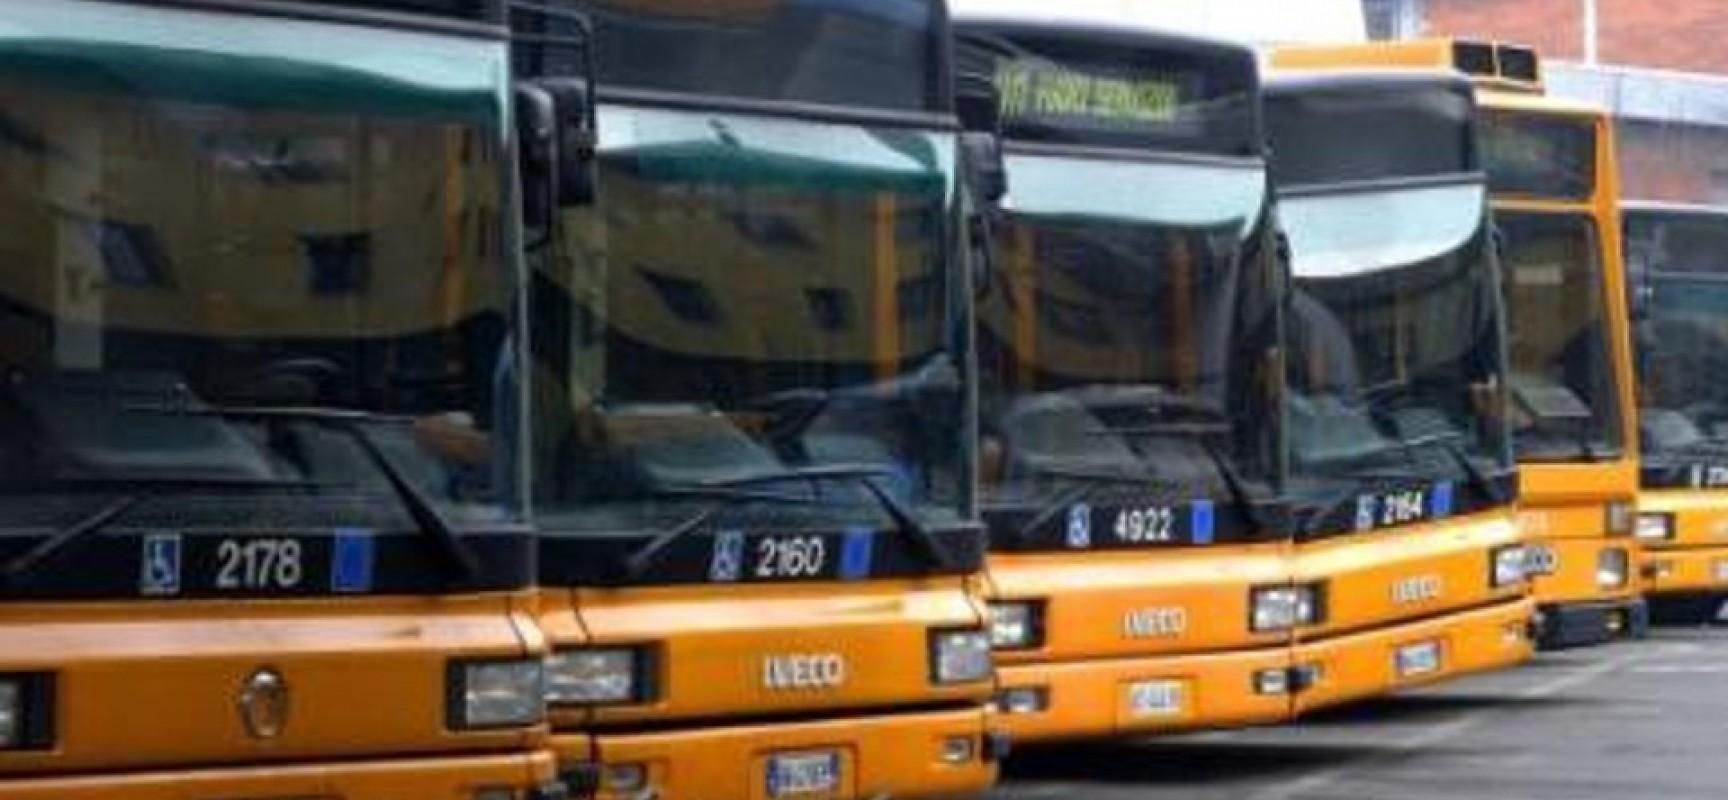 Bonus trasporti pubblici